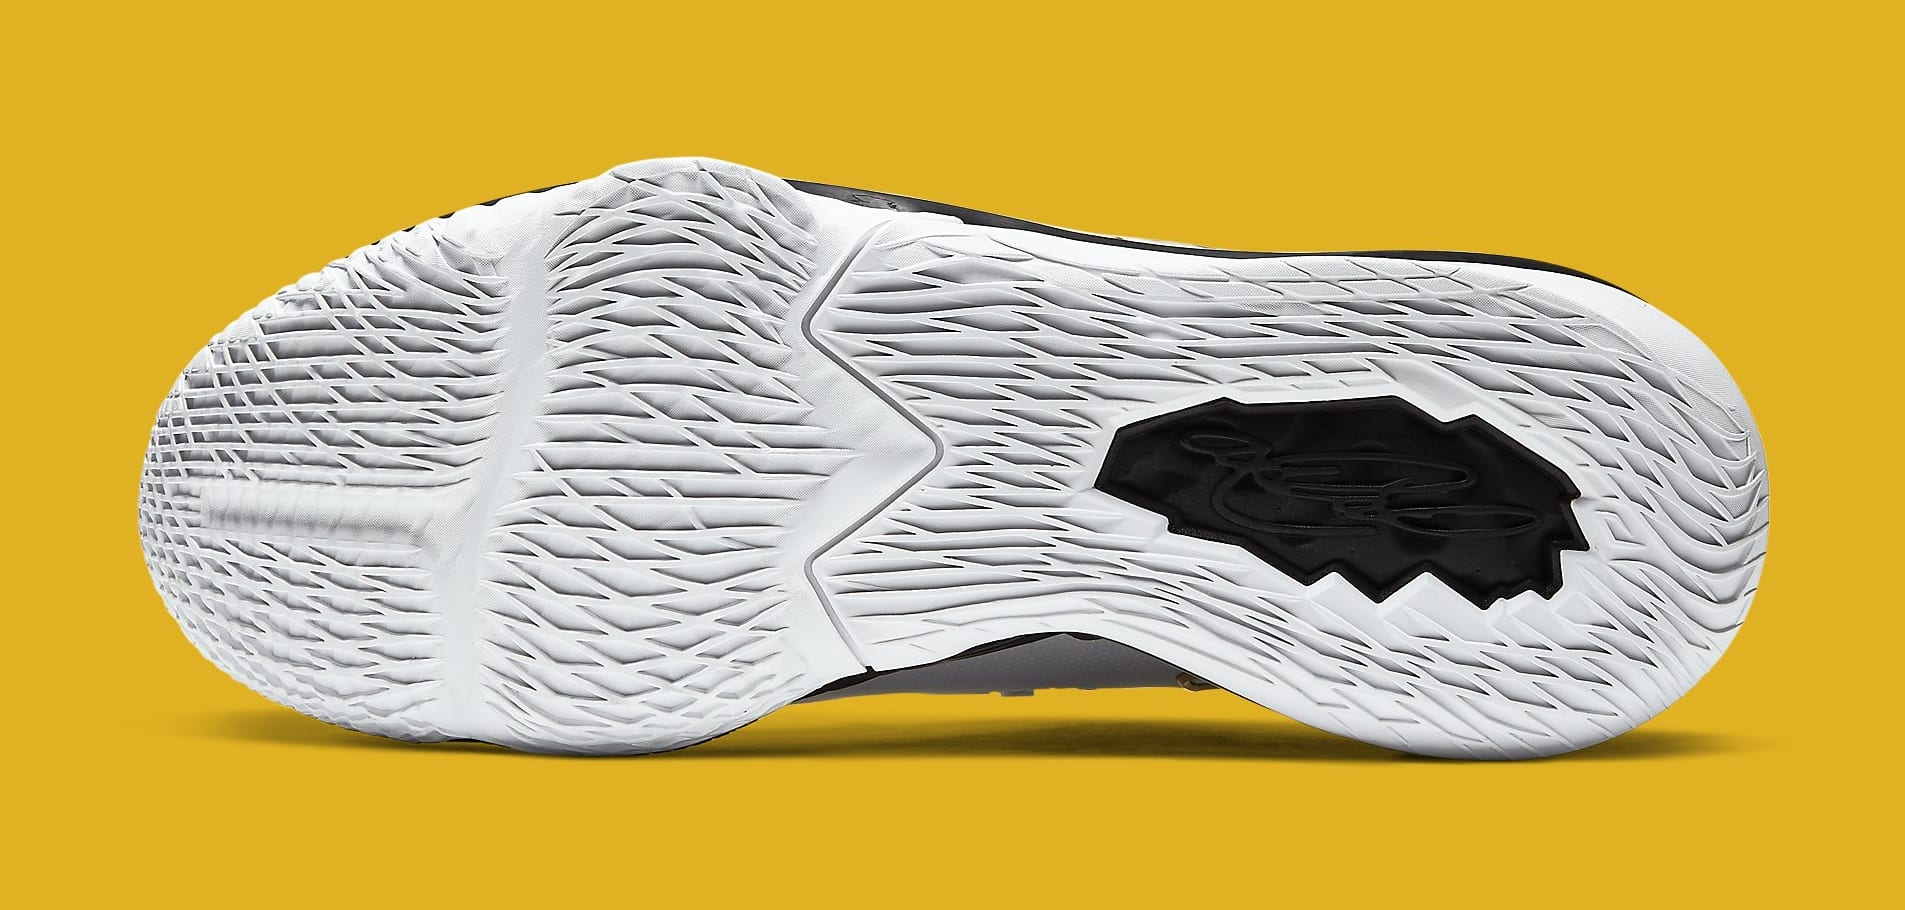 Nike LeBron 17 Low 'Metallic Gold' CD5007-101 Outsole